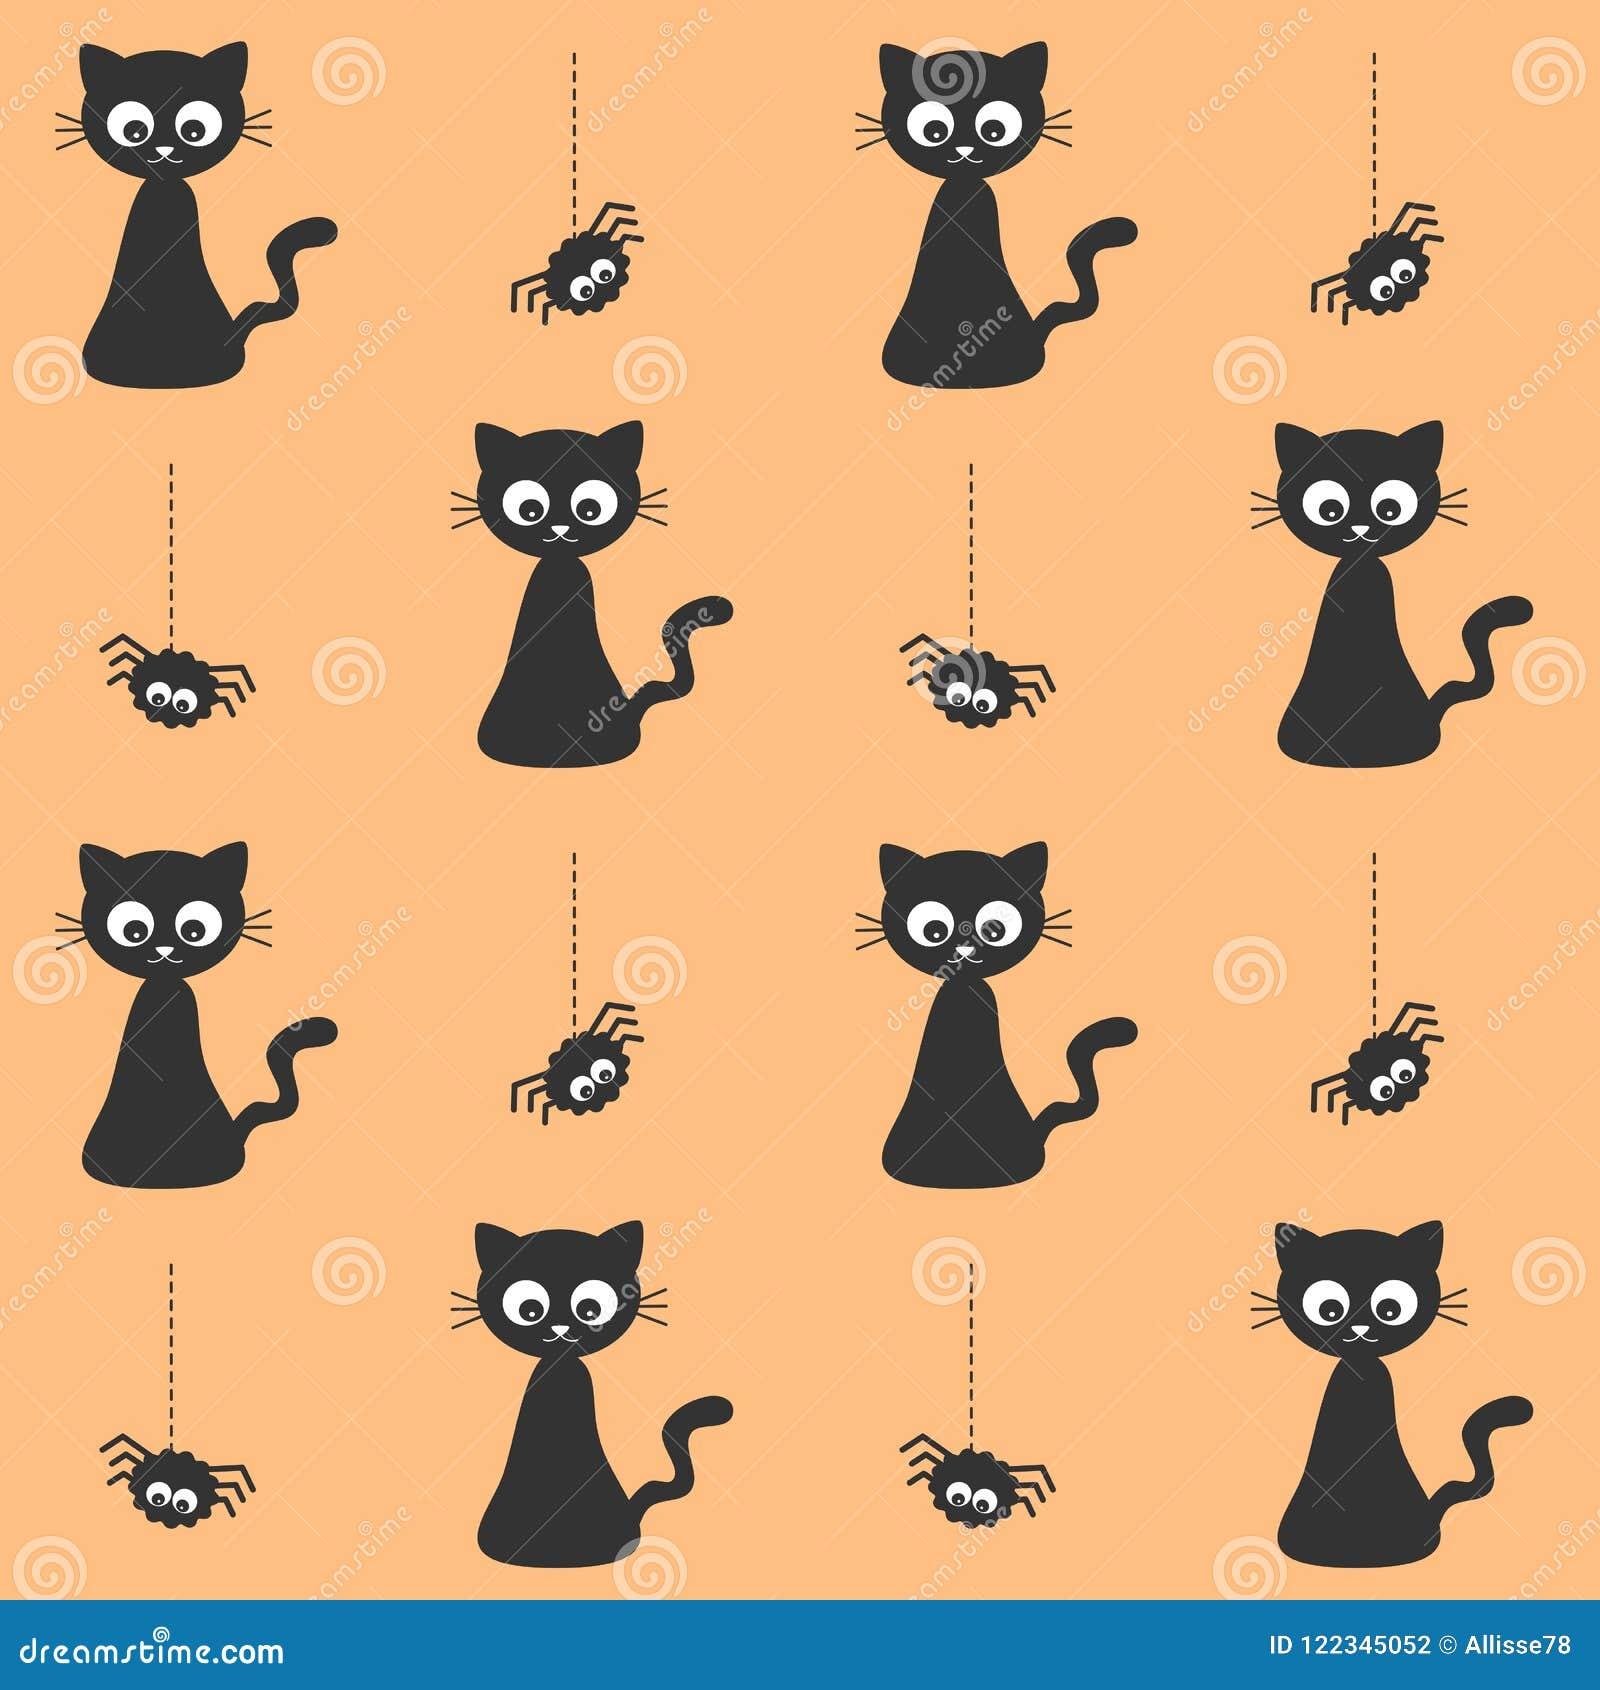 cute cartoon black cat spider halloween seamless vector pattern background illustration 122345052